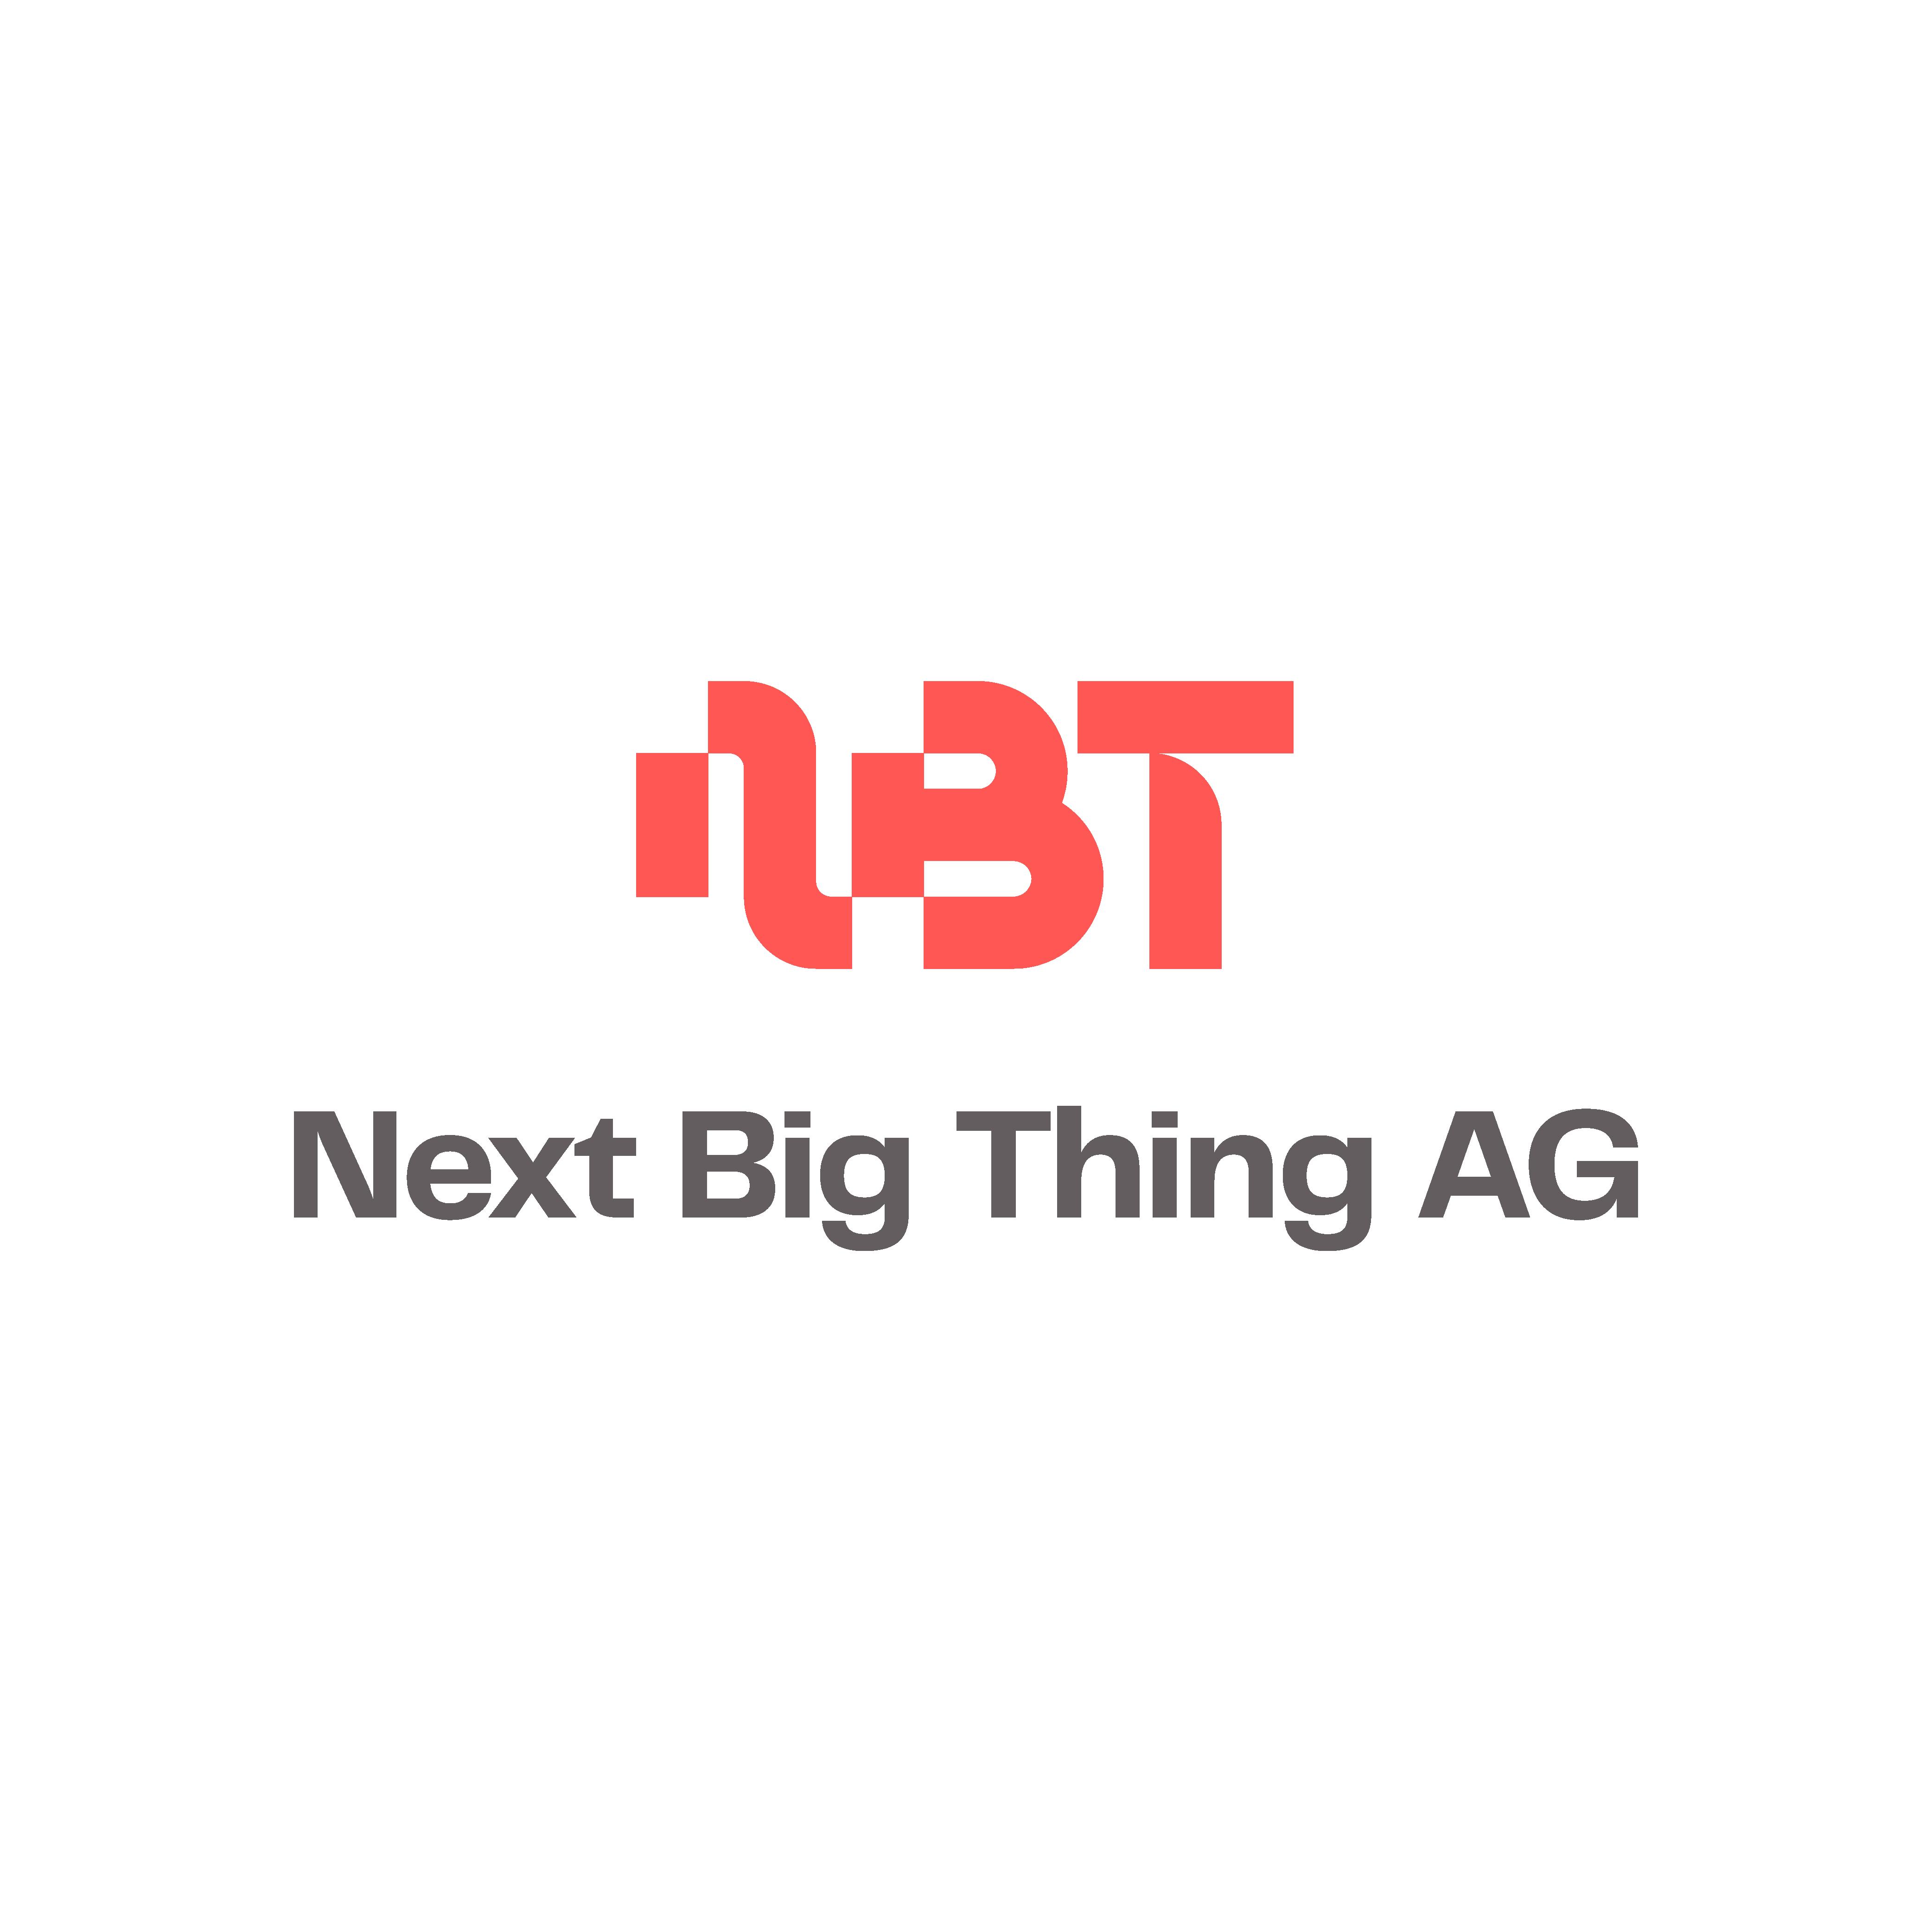 Next Big Thing AG